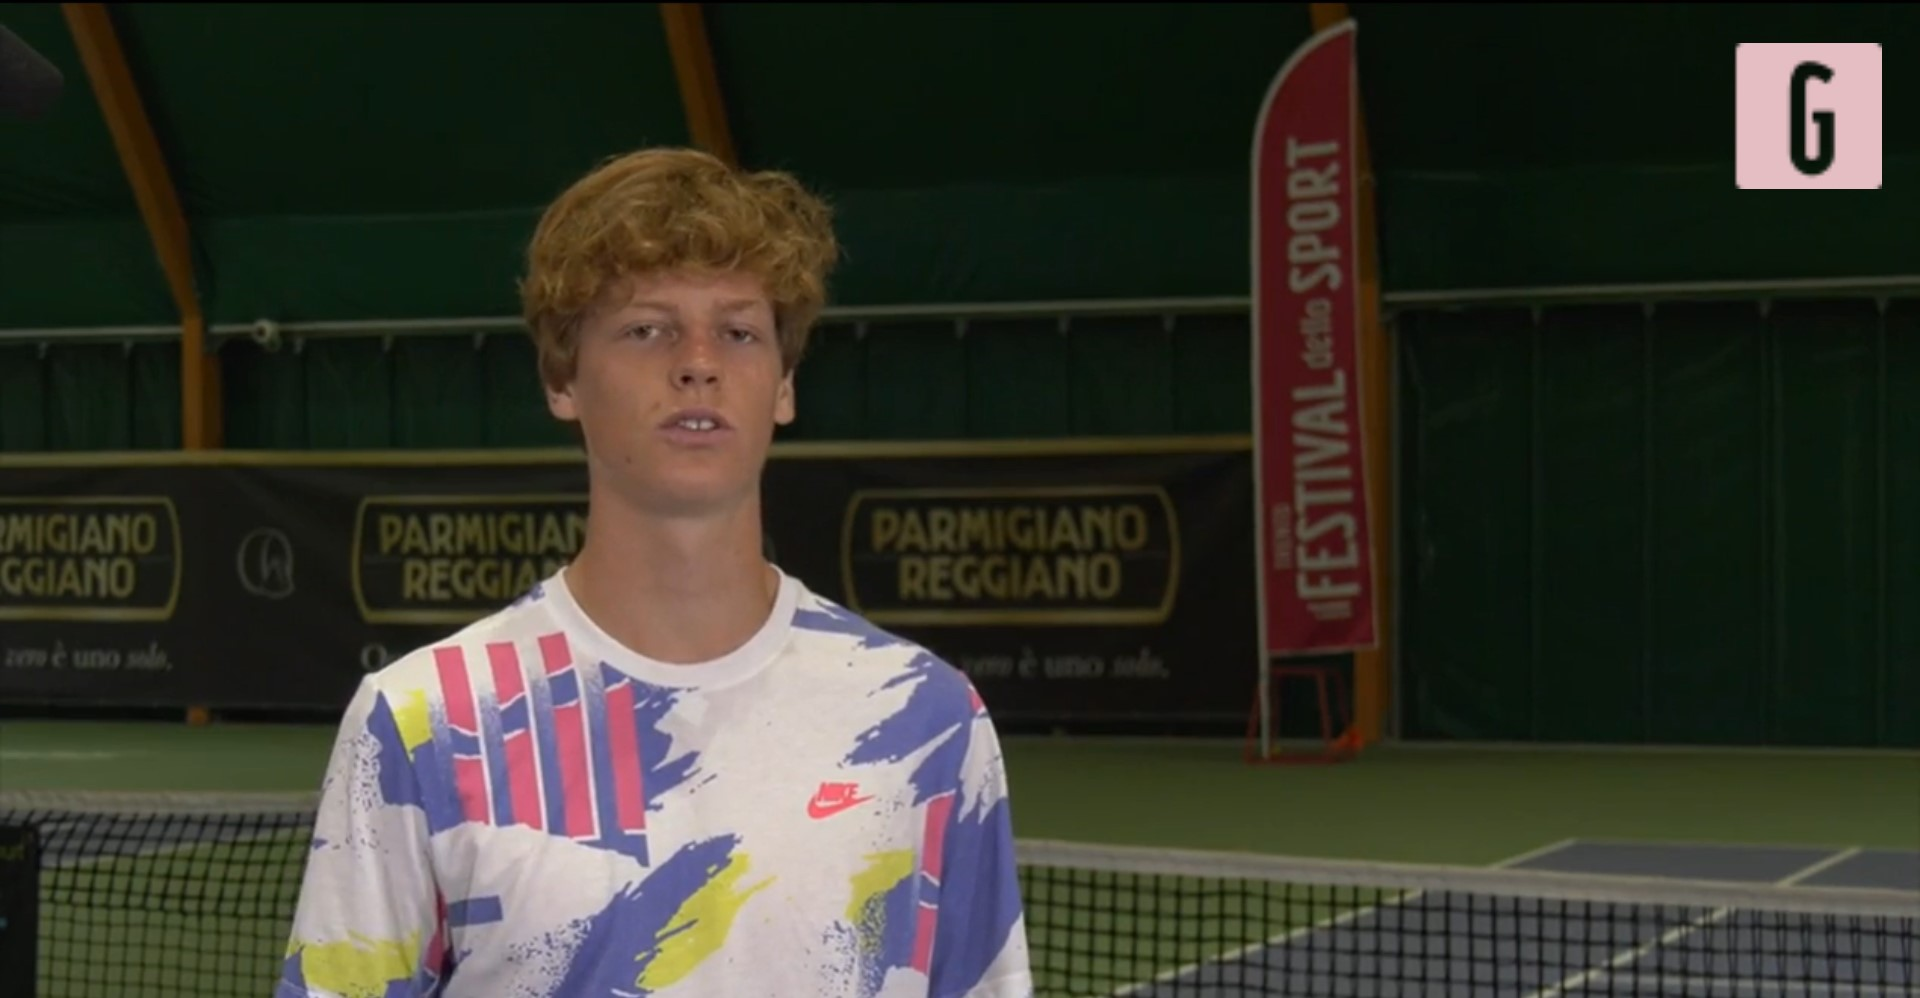 Jannik Sinner, l'astro nascente del tennis mondiale